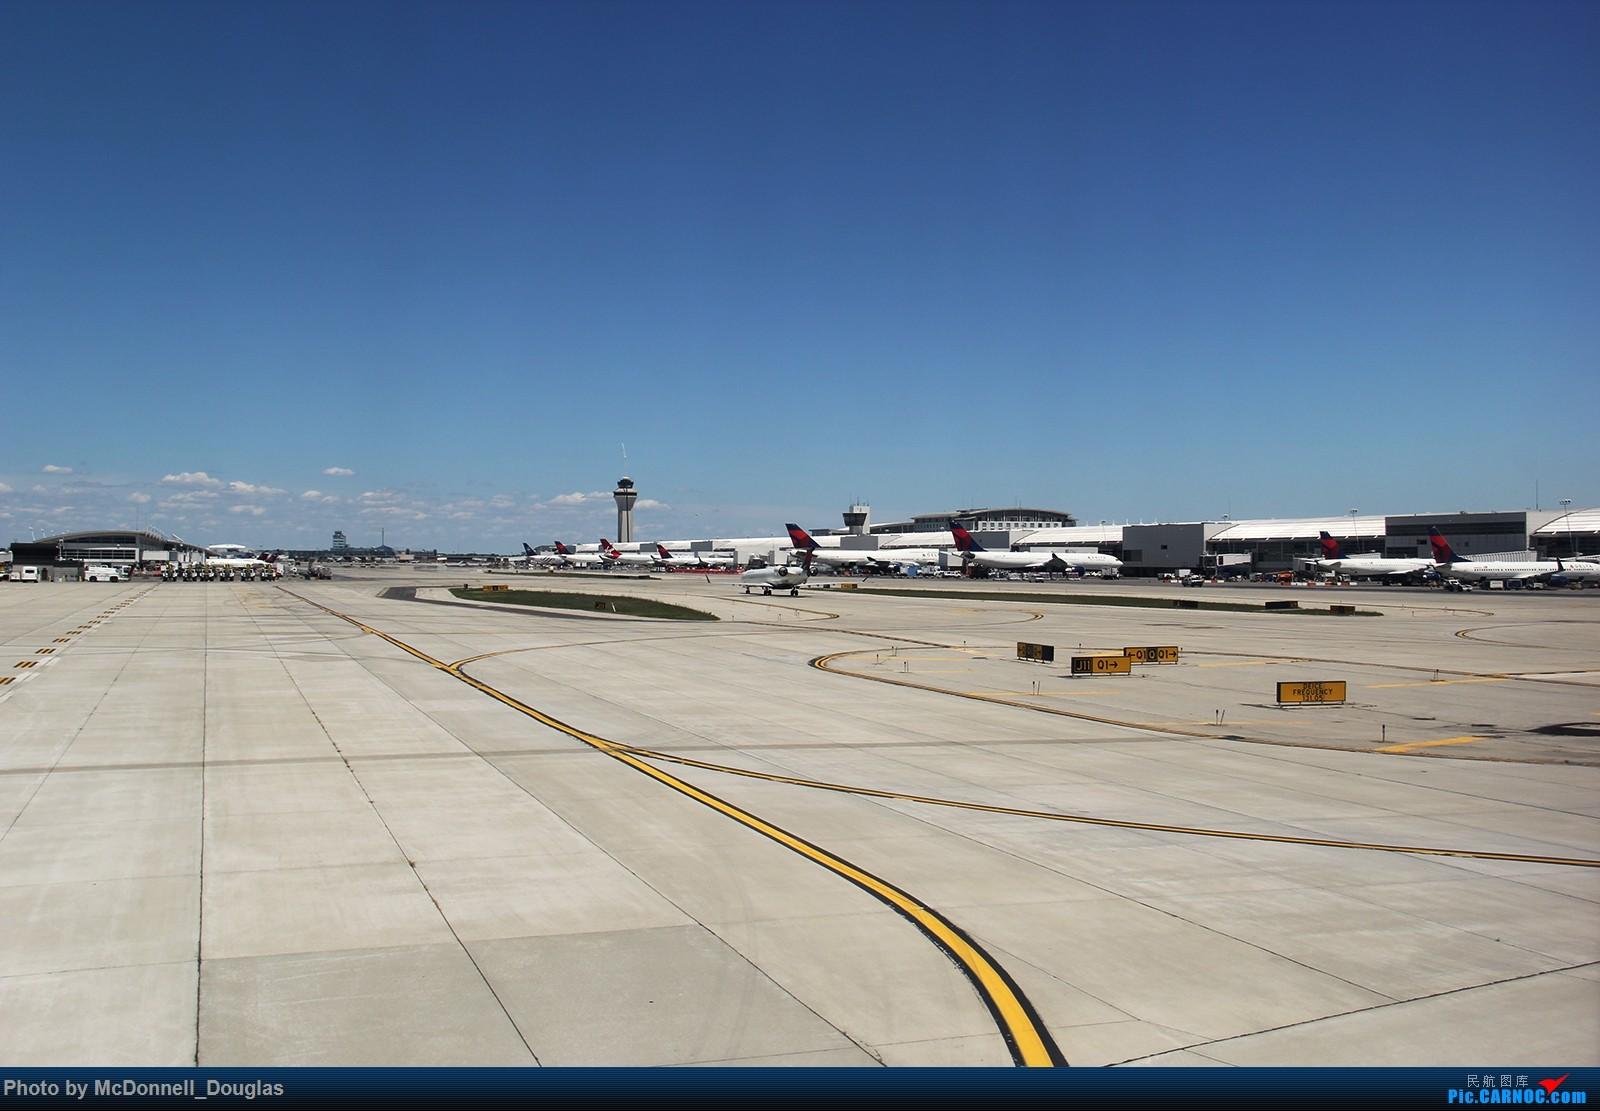 Re:[原创]【上海飞友会】图会很多,也有很多驾驶舱,杂七杂八的美帝,梦寐以求的圣马丁,这更绝不弃贴,前十个id砸飞机砸一个返一个    美国底特律都会韦恩郡机场